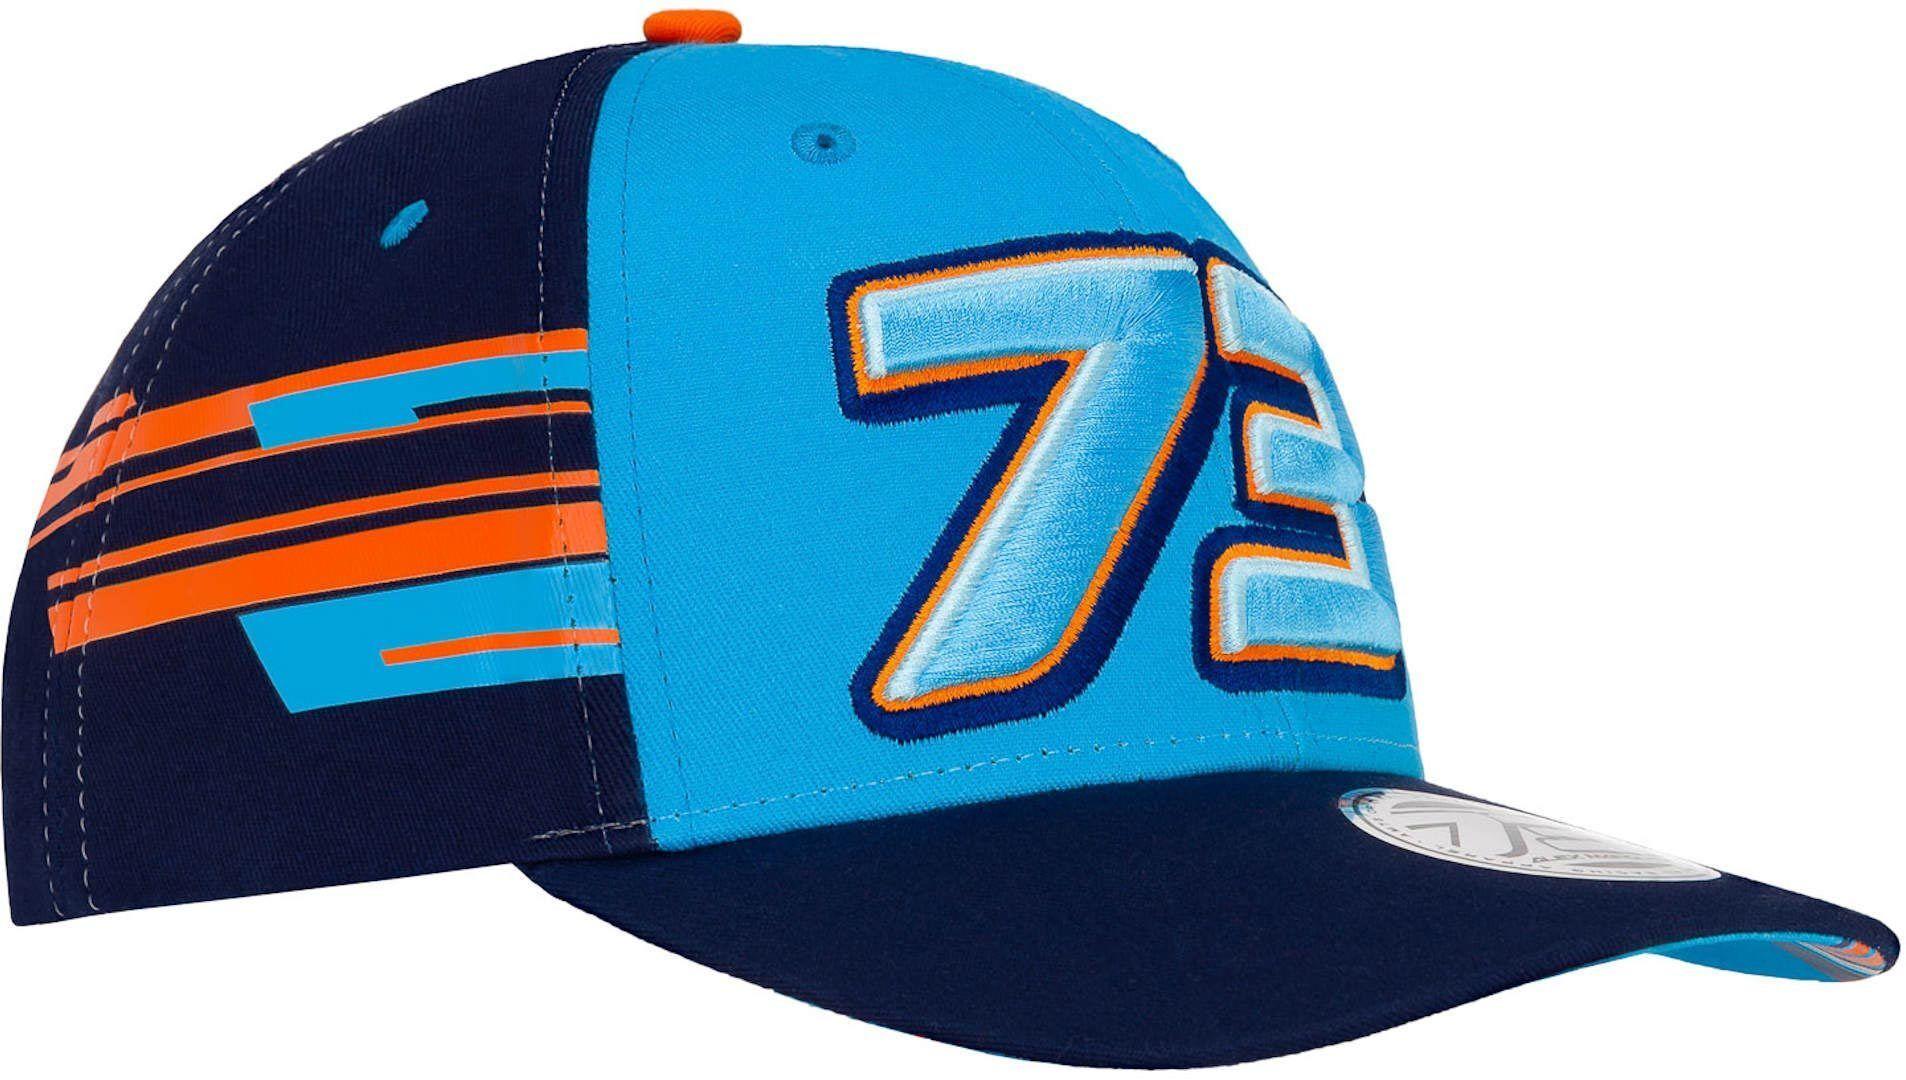 GP-Racing 73 Flat Midvisor Cap Blue One Size